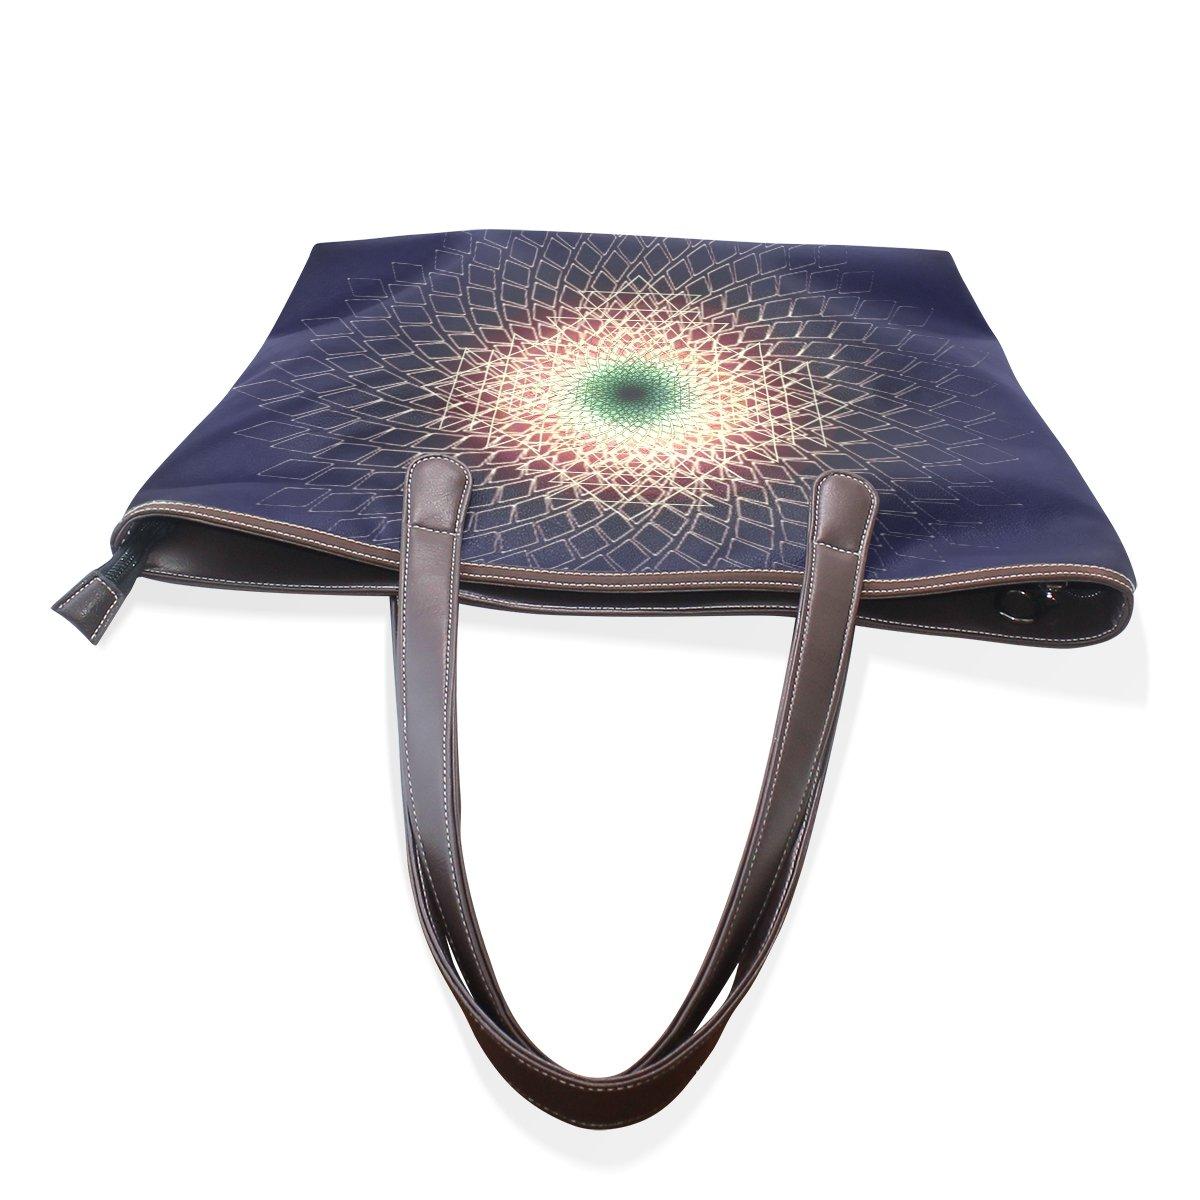 Mr.Weng Household Abstract Geometry Lady Handbag Tote Bag Zipper Shoulder Bag